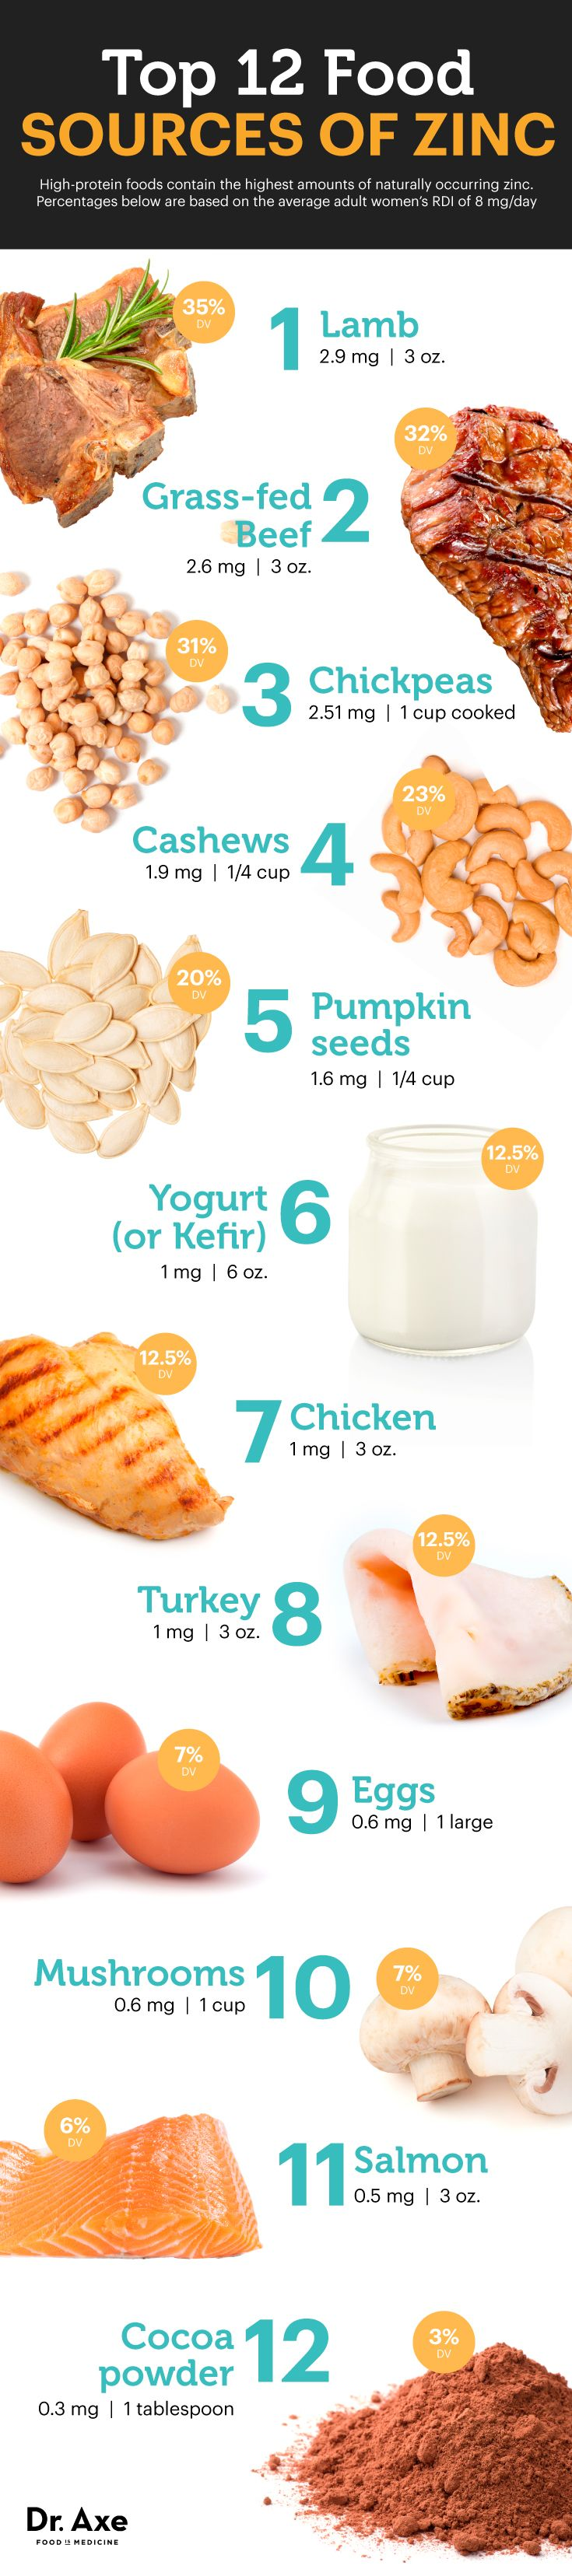 Zinc foods   http://www.draxe.com  #health #Holistic #natural #diy #recipe